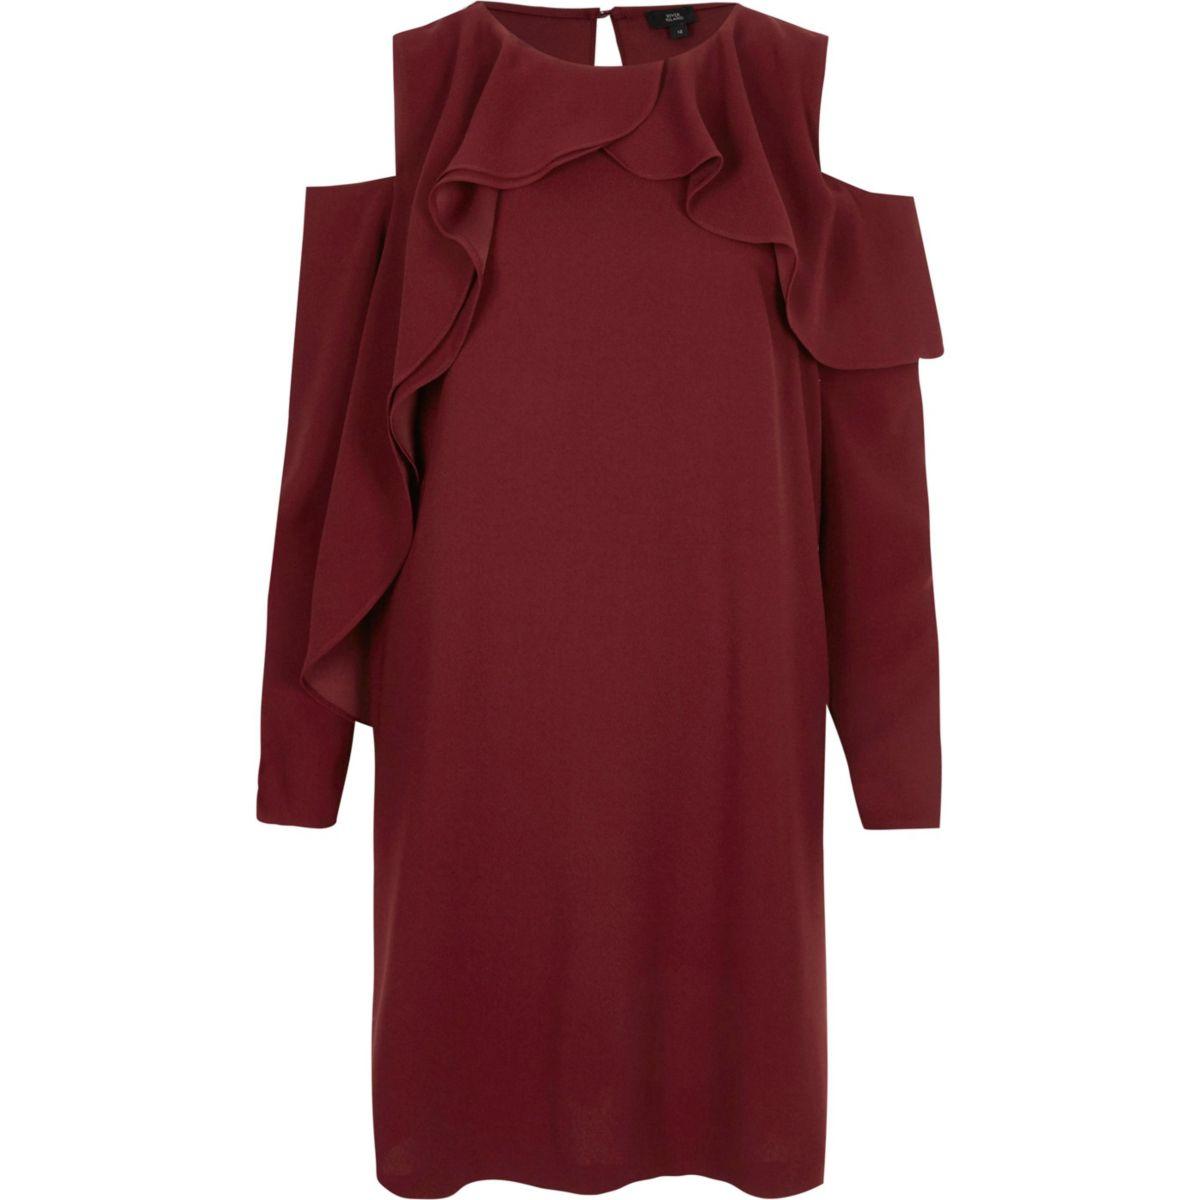 Dark red cold shoulder frill swing dress